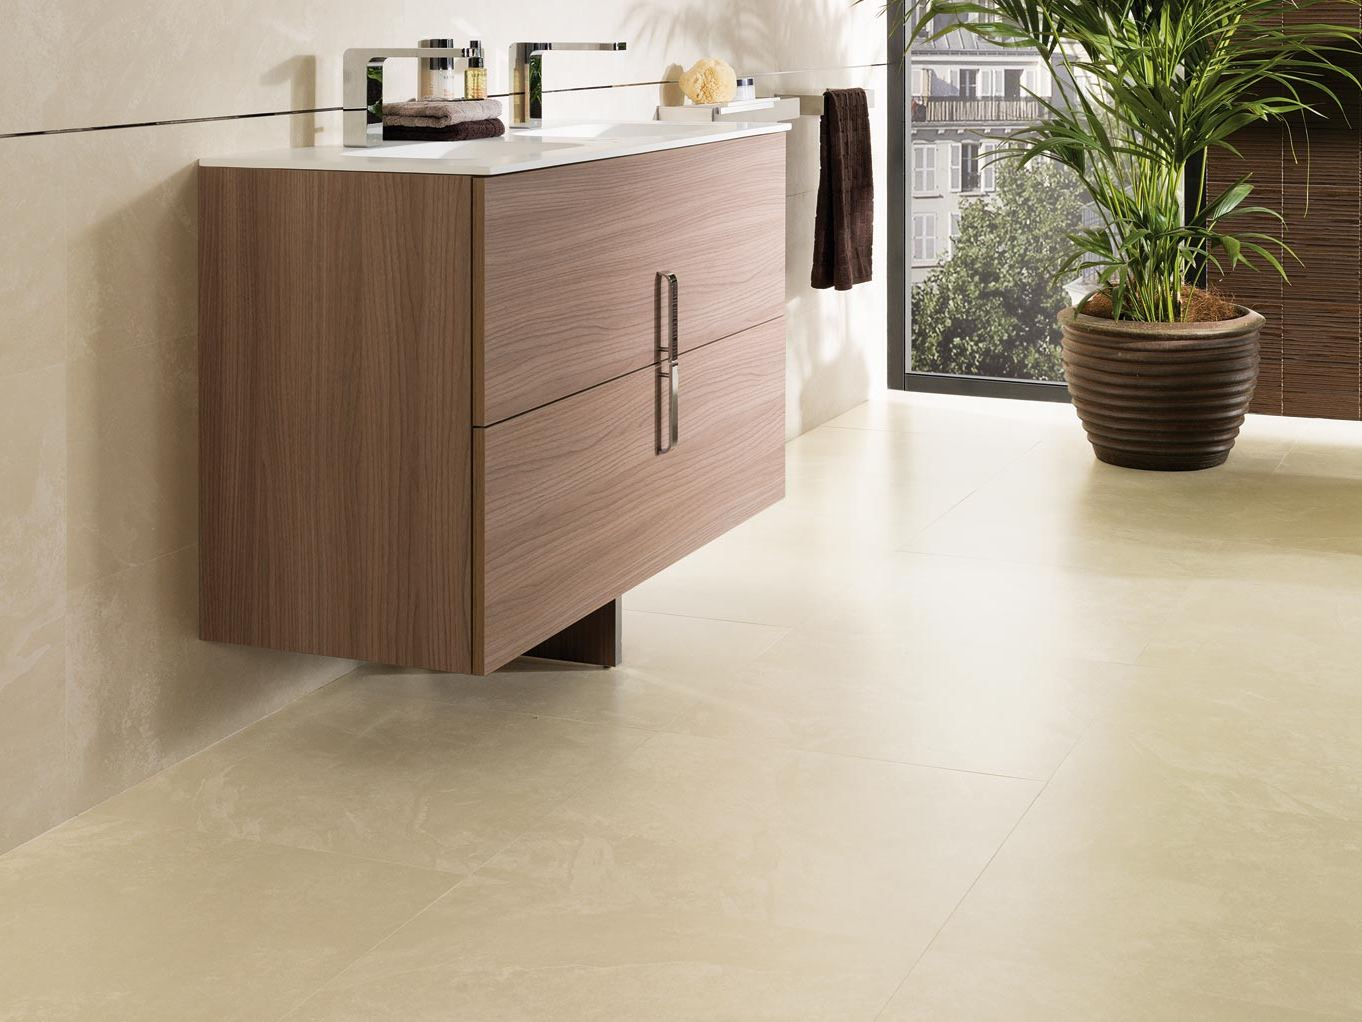 Wall floor tiles ston ker natal ston ker collection by - Porcelanosa castellon ...